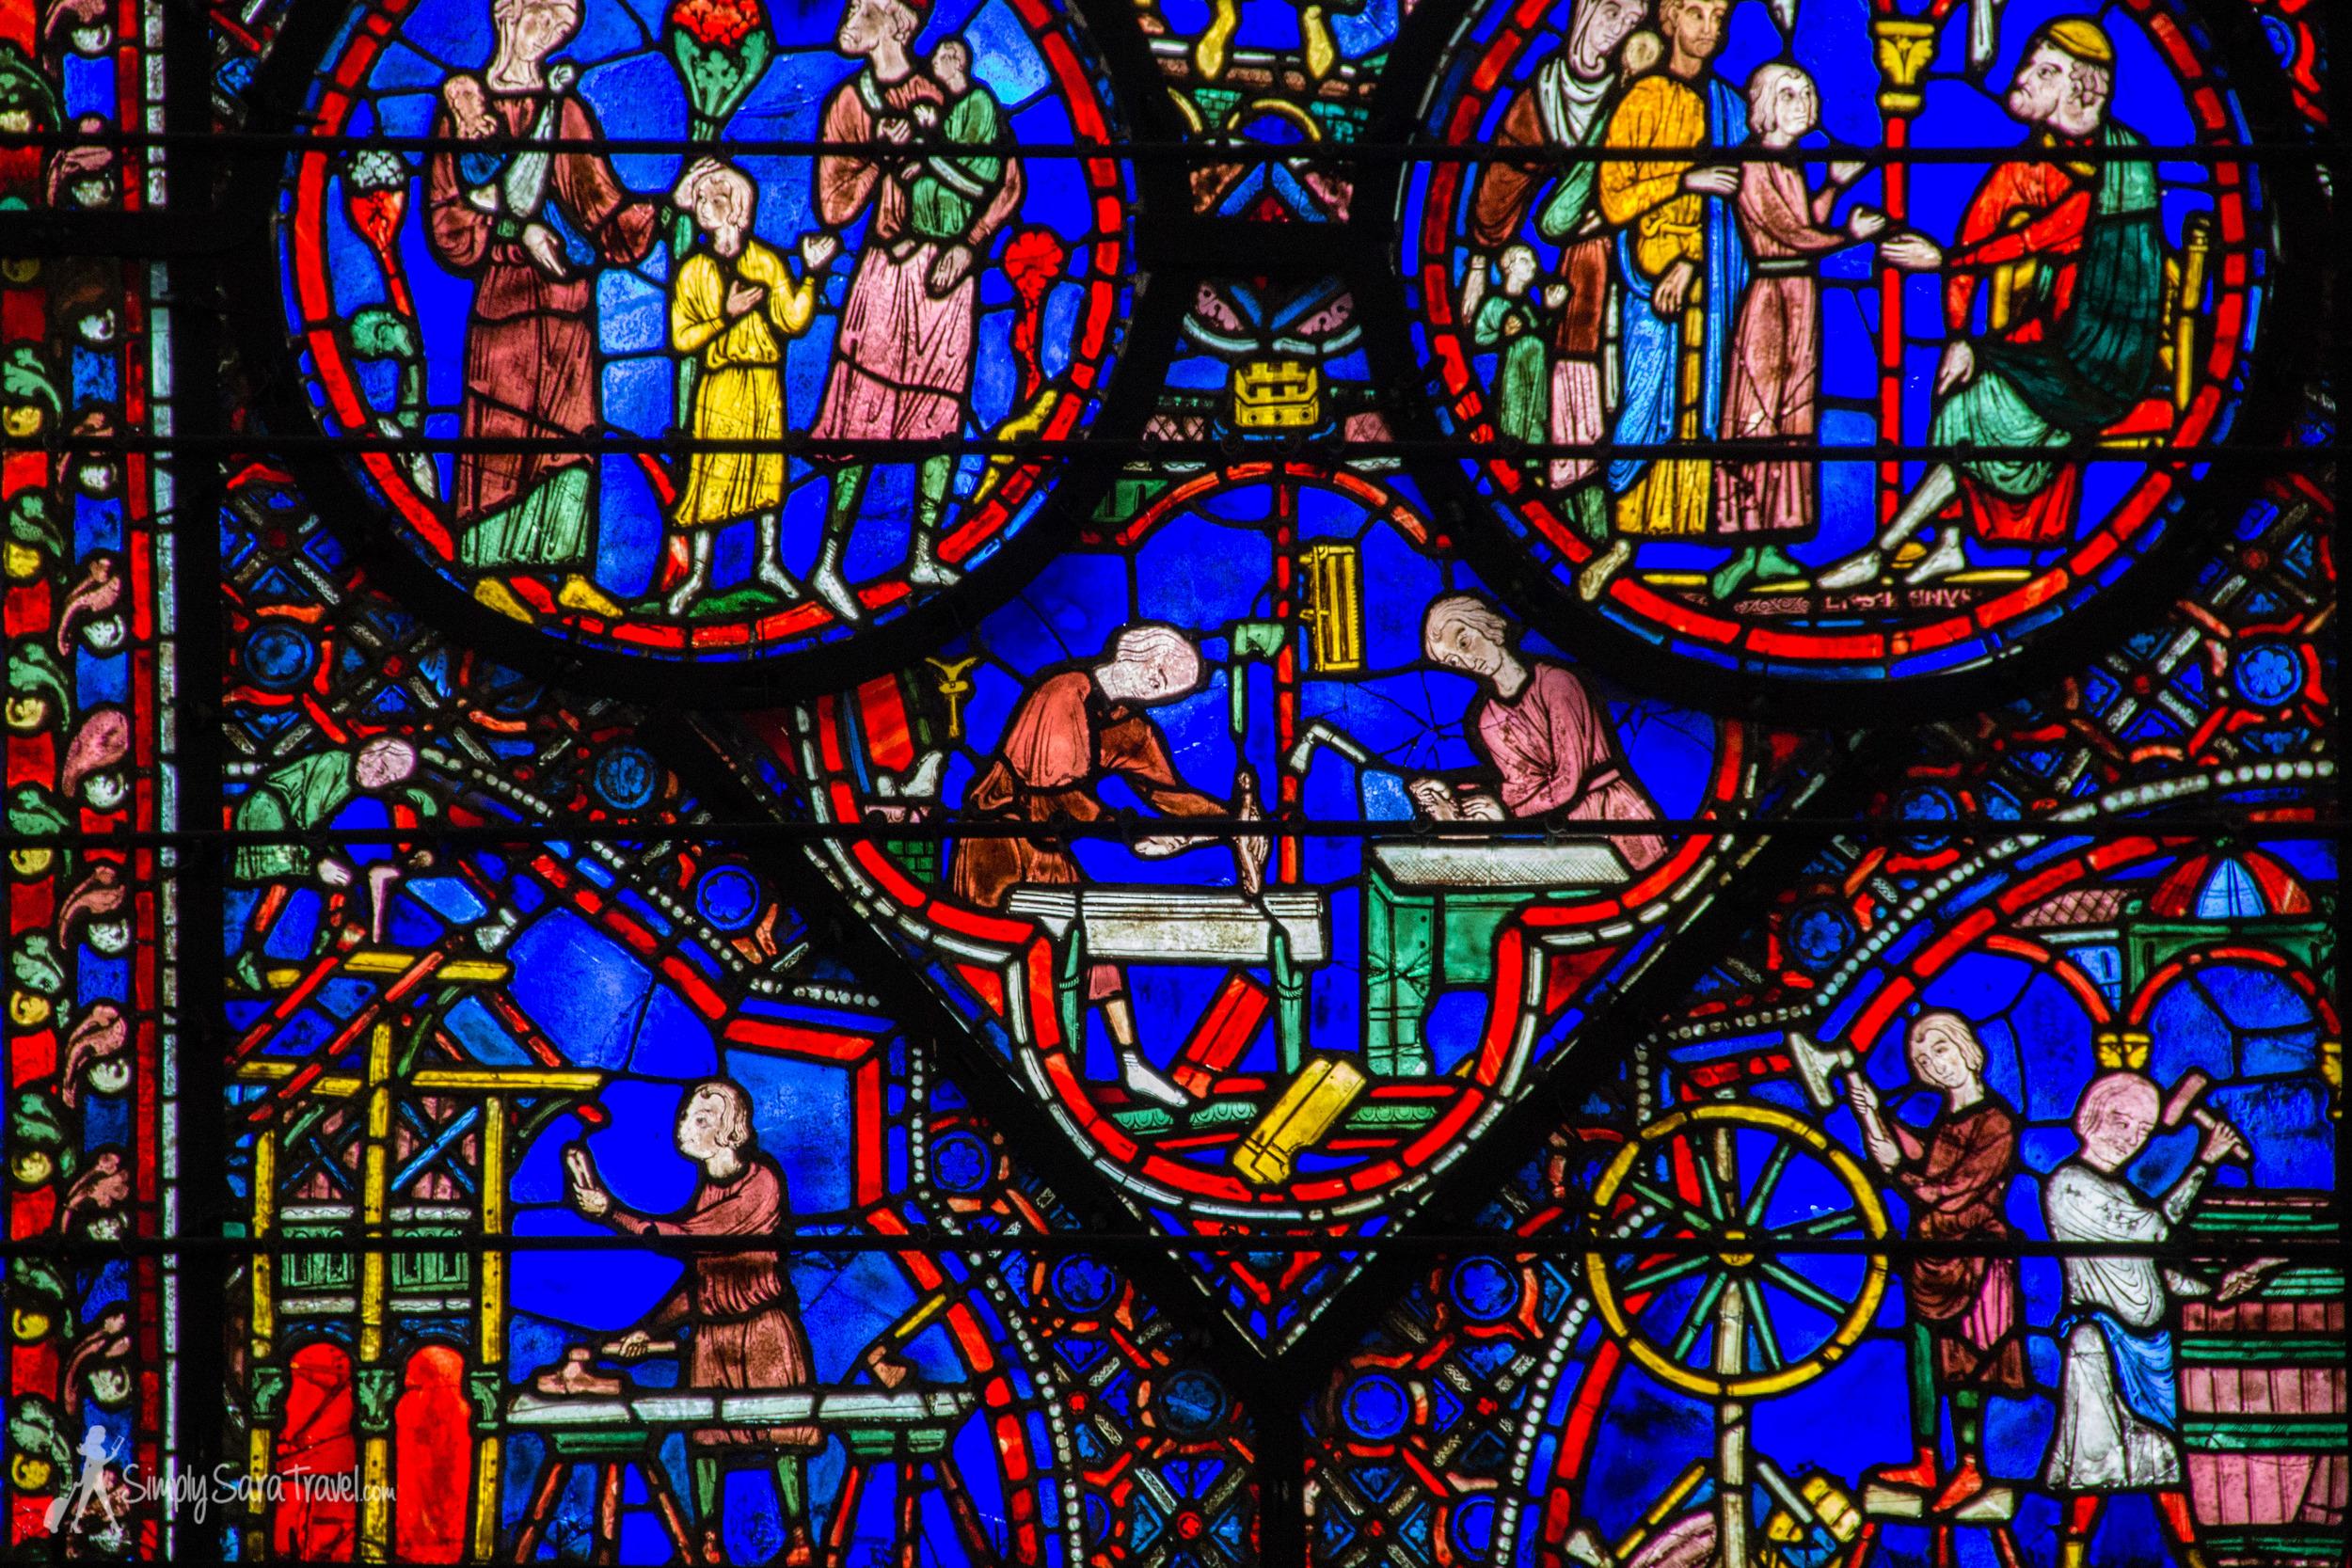 Chartres wondow